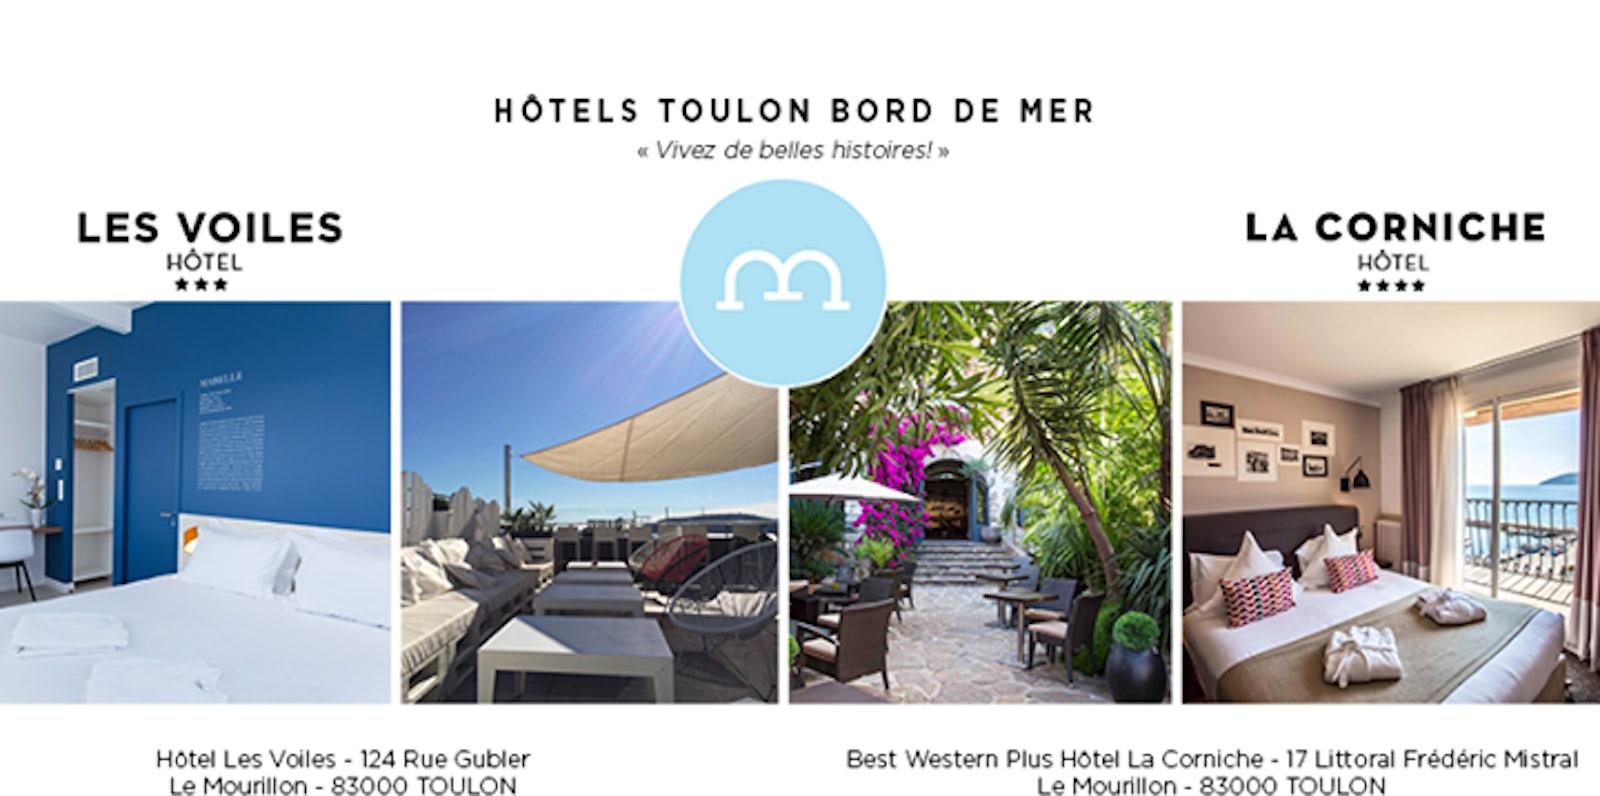 Travel inspired - Location - Hôtels Toulon Bord de Mer   itinari